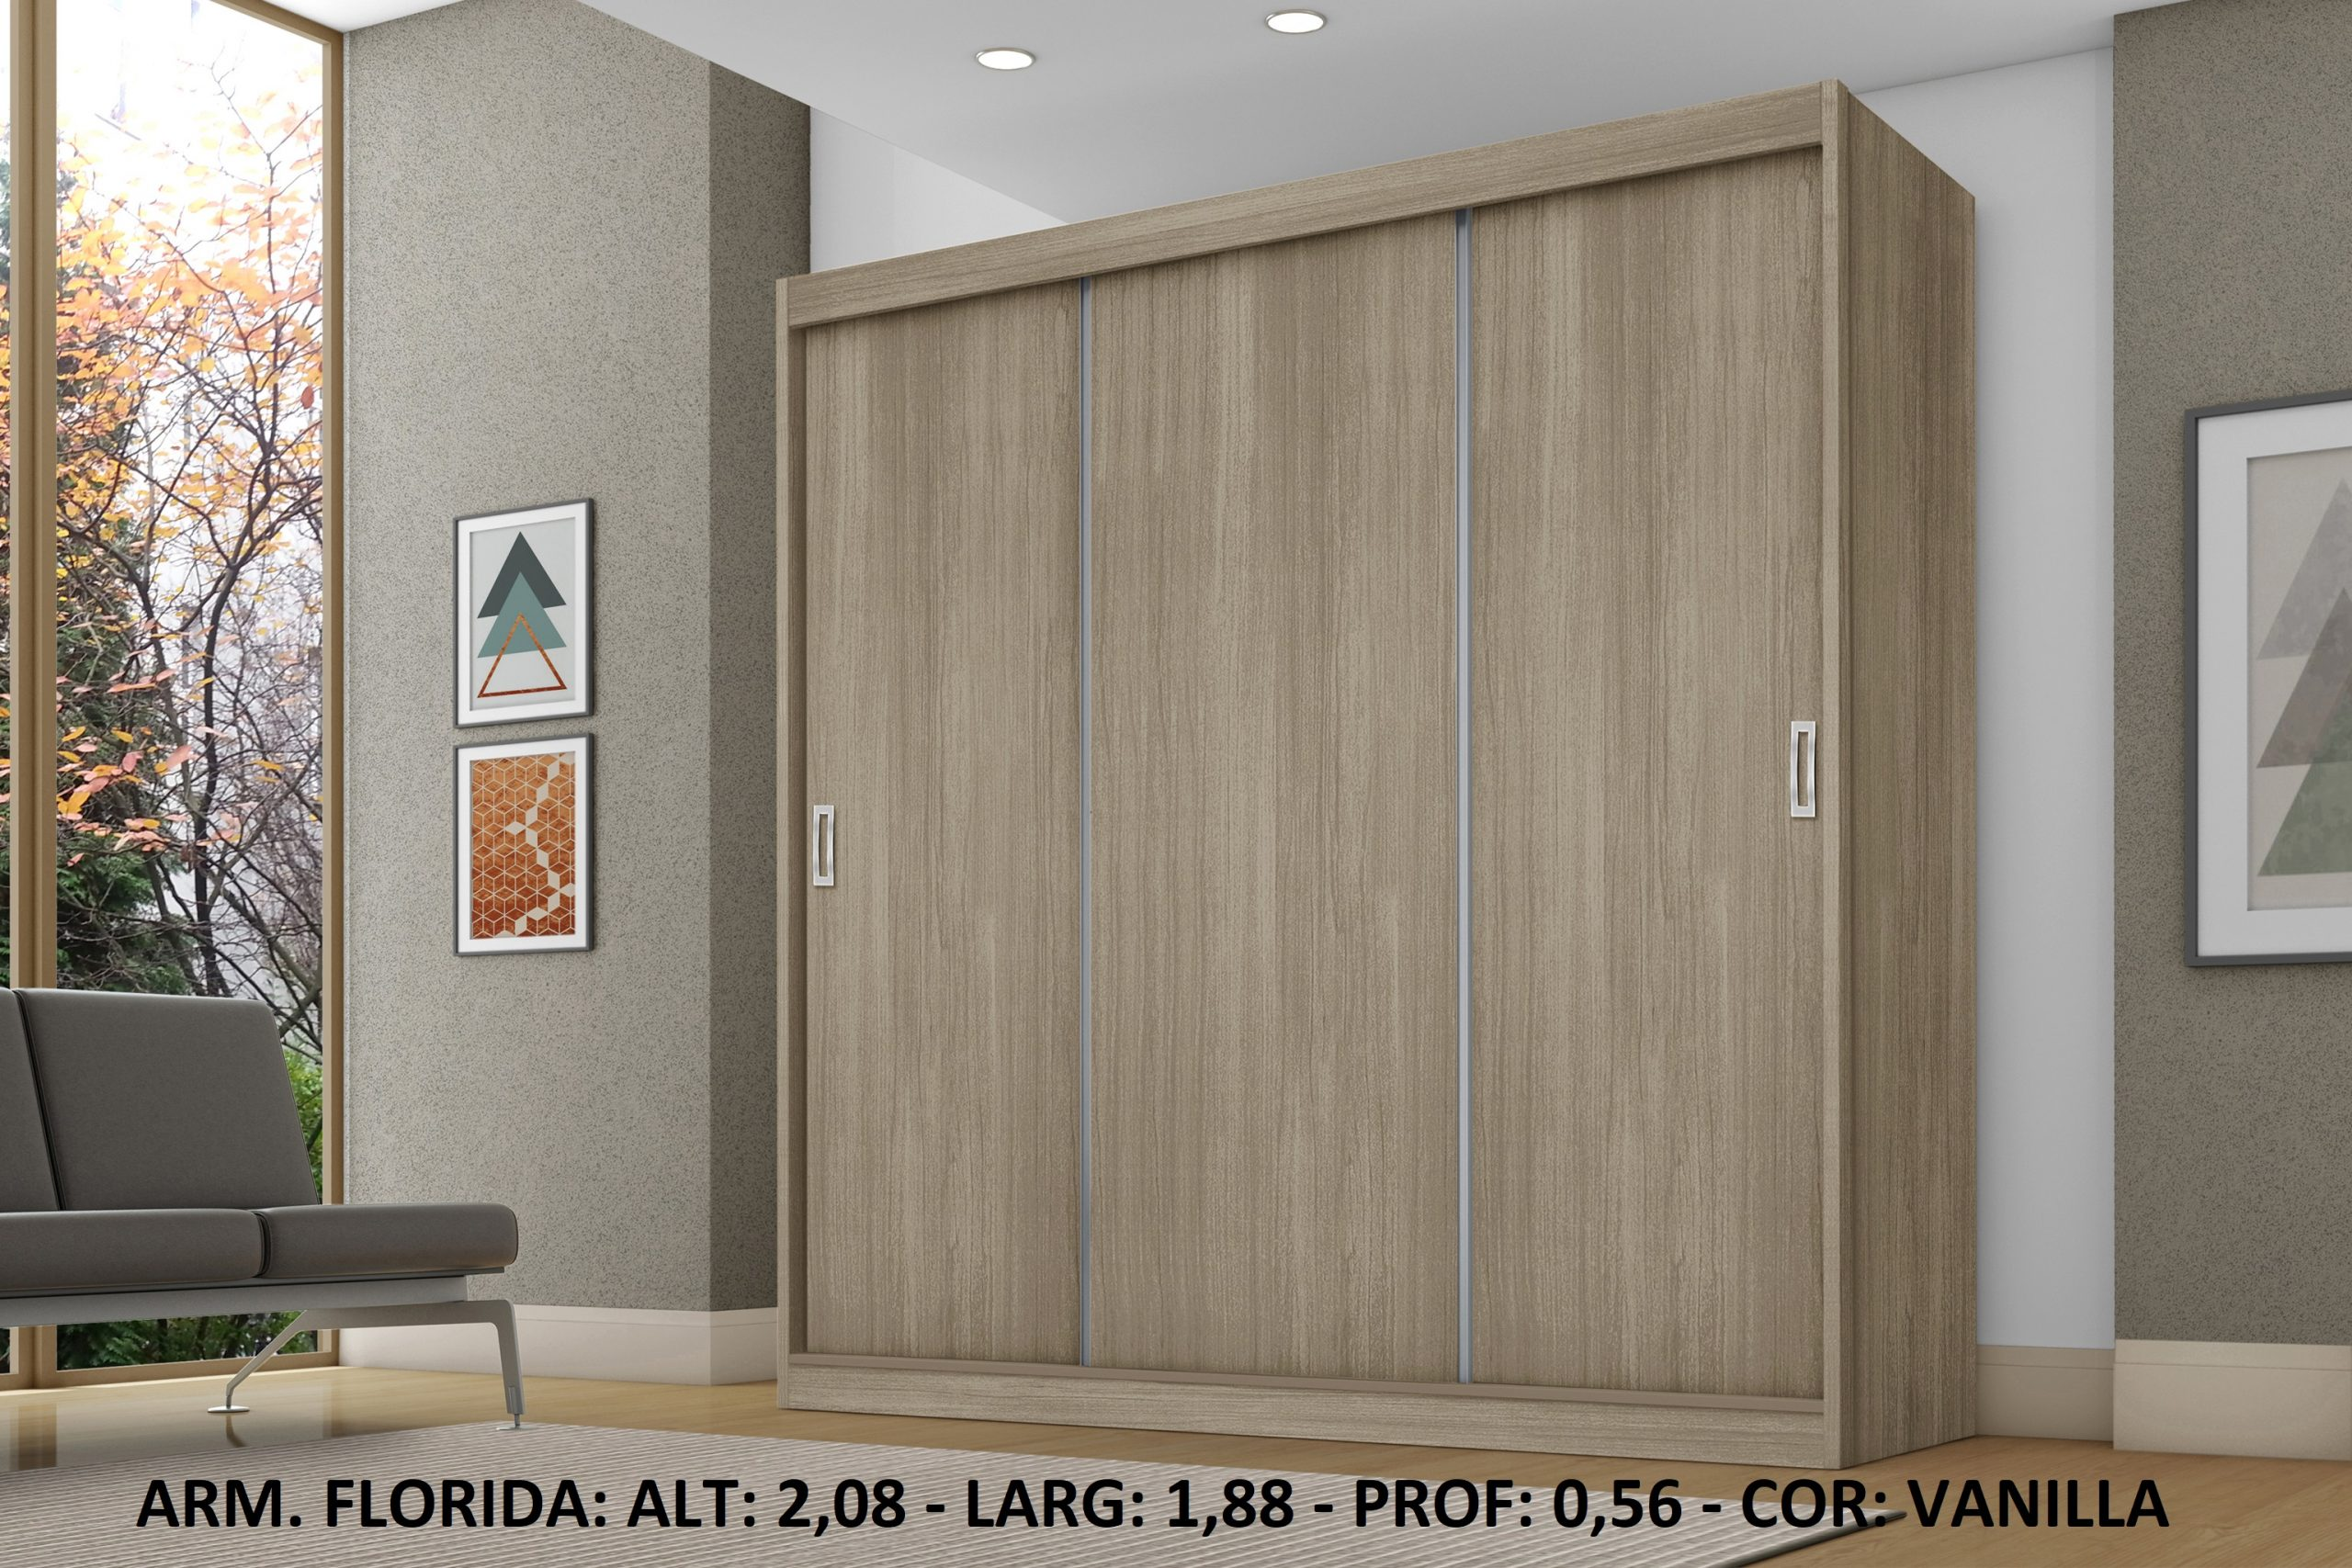 4_Arm Florida - Vanilla 2A